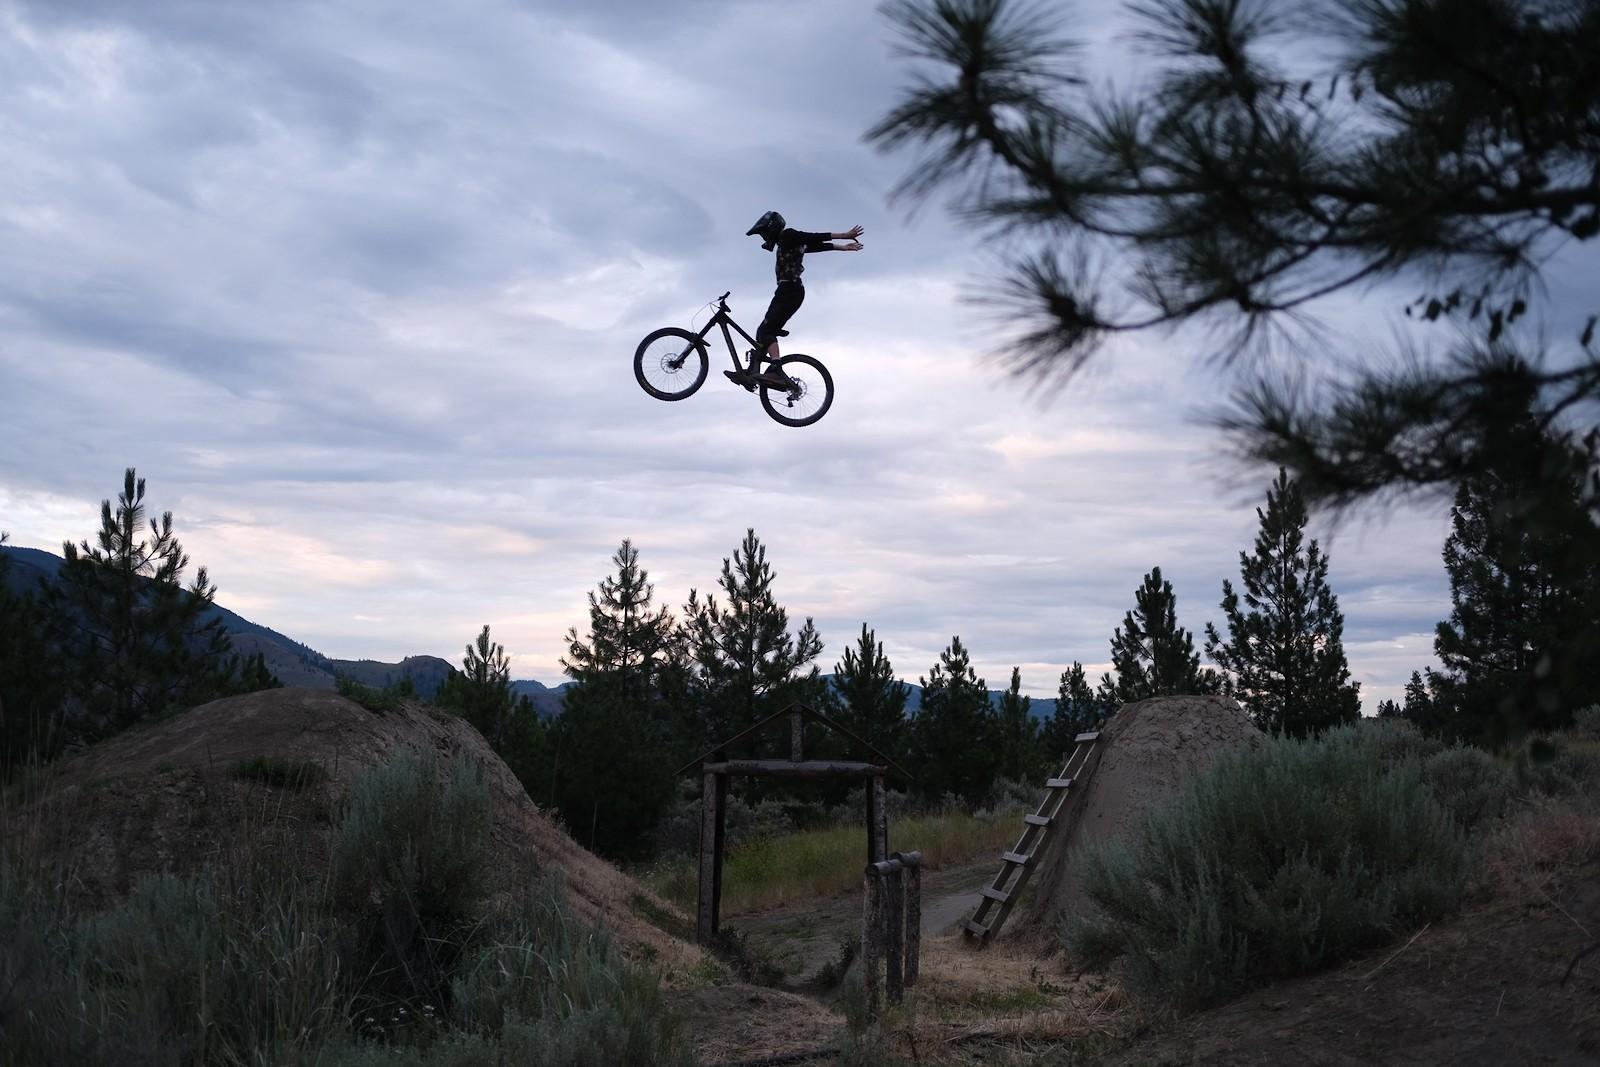 Kamloops Bike Ranch - Julian_Clauss - Mountain Biking Pictures - Vital MTB